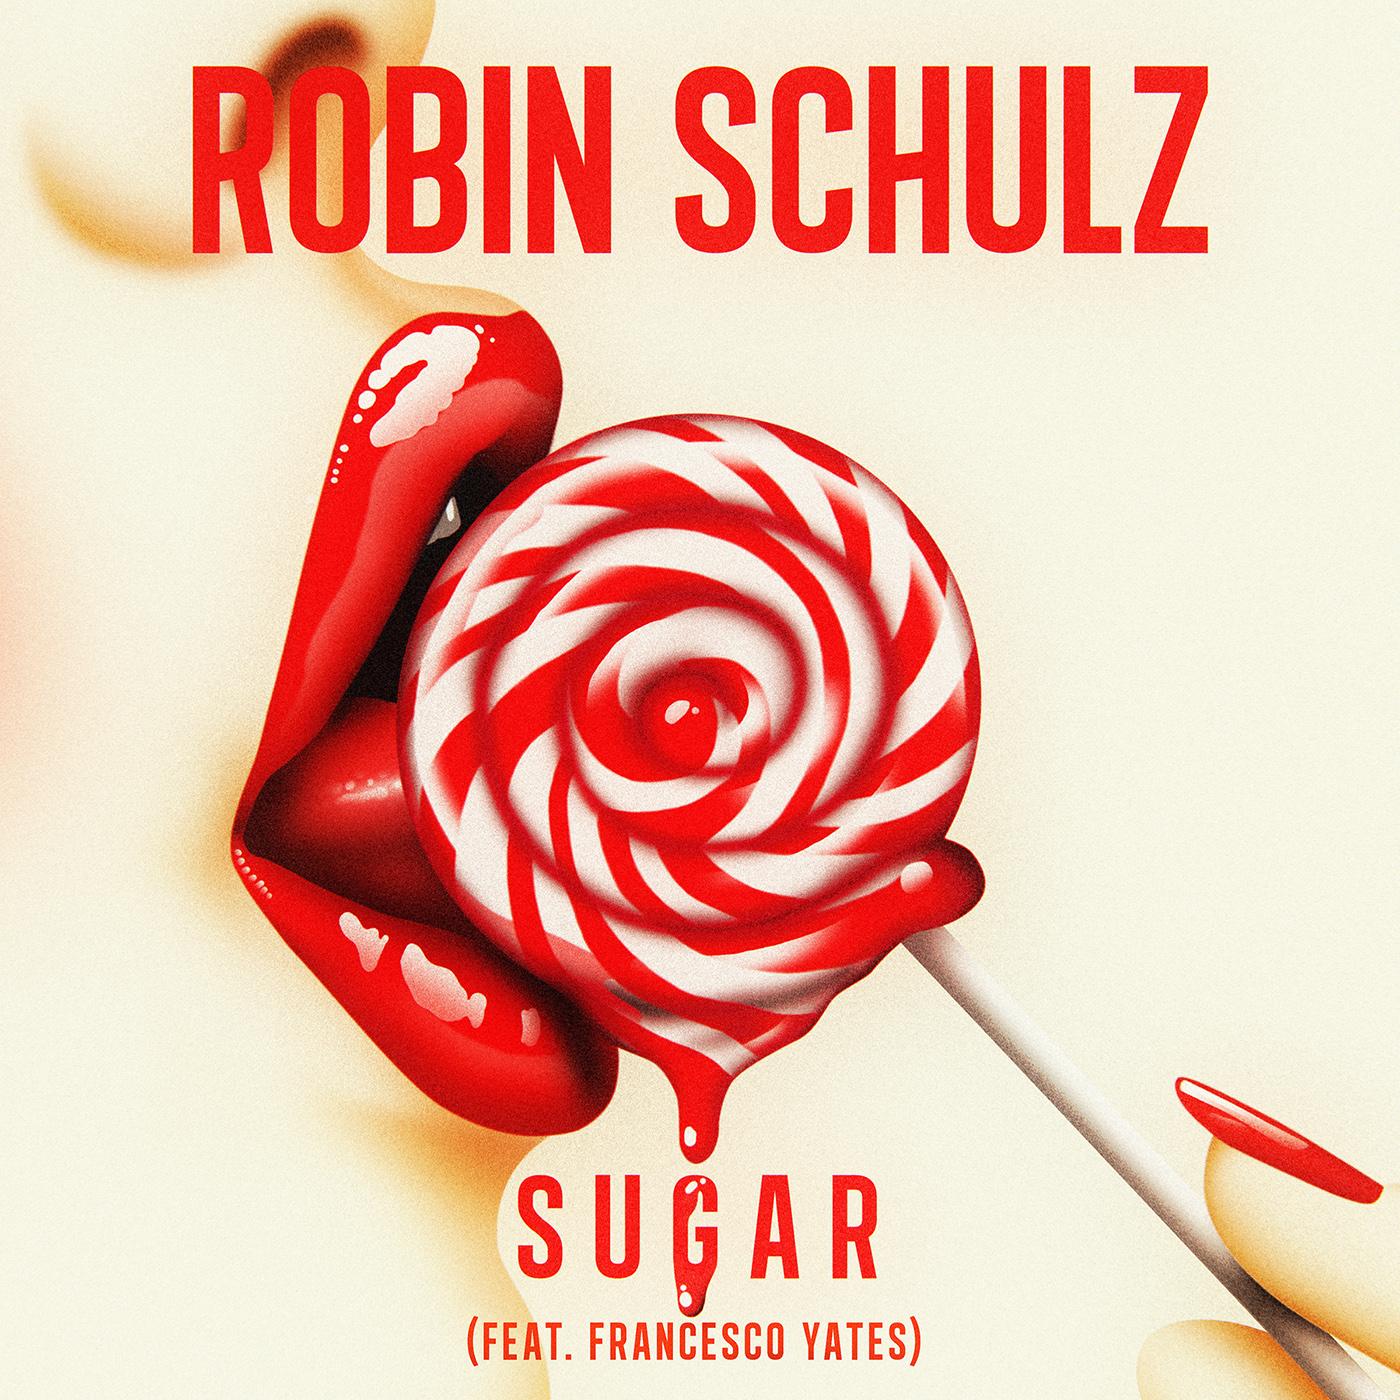 Cover: ROBIN SCHULZ FEAT. FRANCESCO Y,